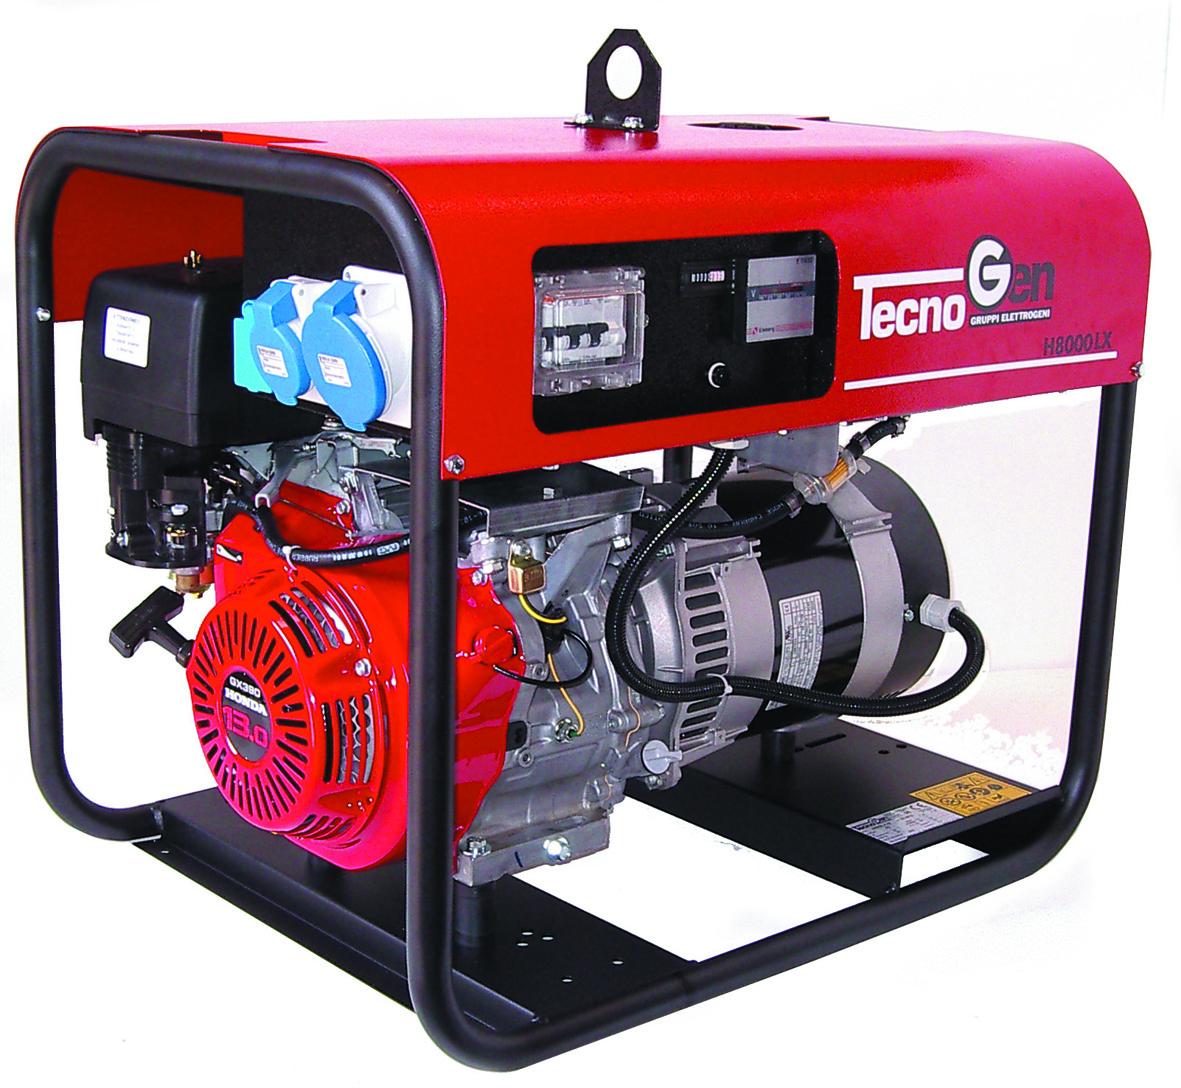 Image of Generatore di corrente TecnoGen H8000ELX